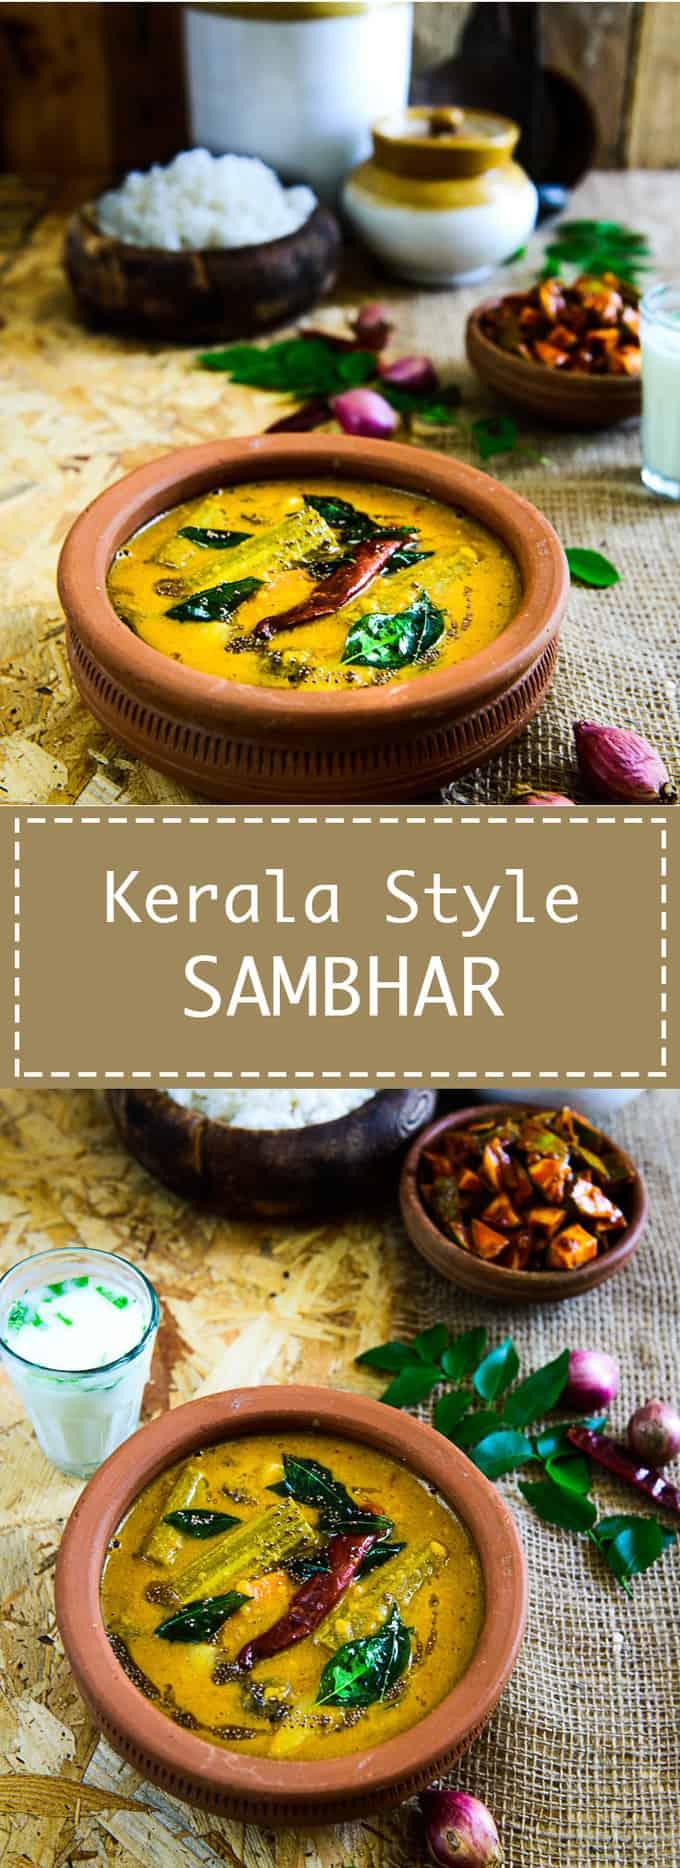 Kerala style sambhar